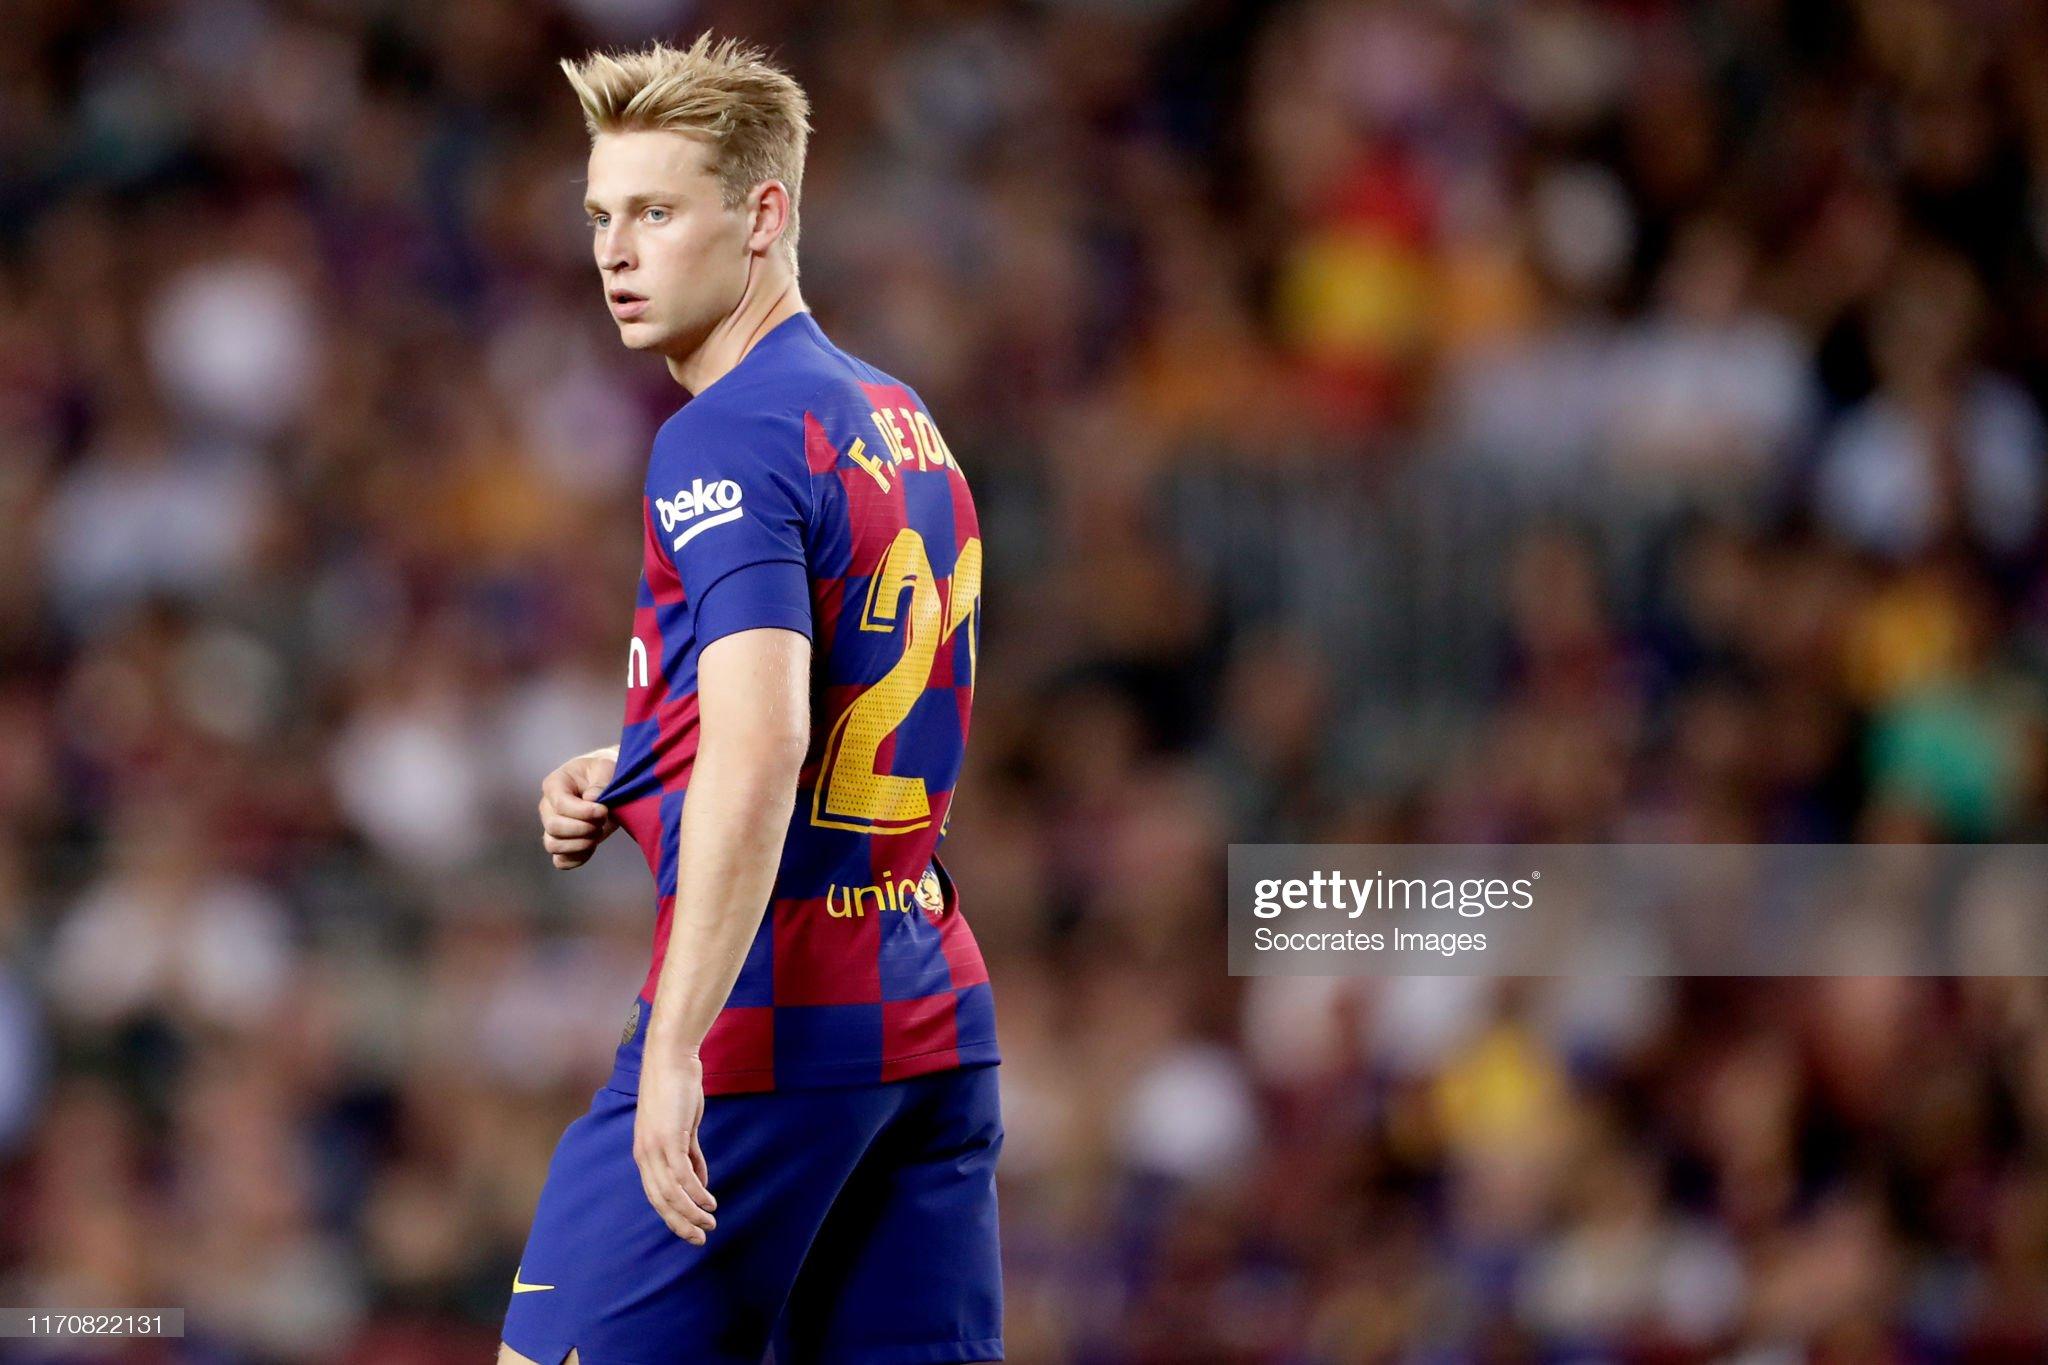 صور مباراة : برشلونة - فياريال 2-1 ( 24-09-2019 )  Frenkie-de-jong-of-fc-barcelona-during-the-la-liga-santander-match-picture-id1170822131?s=2048x2048